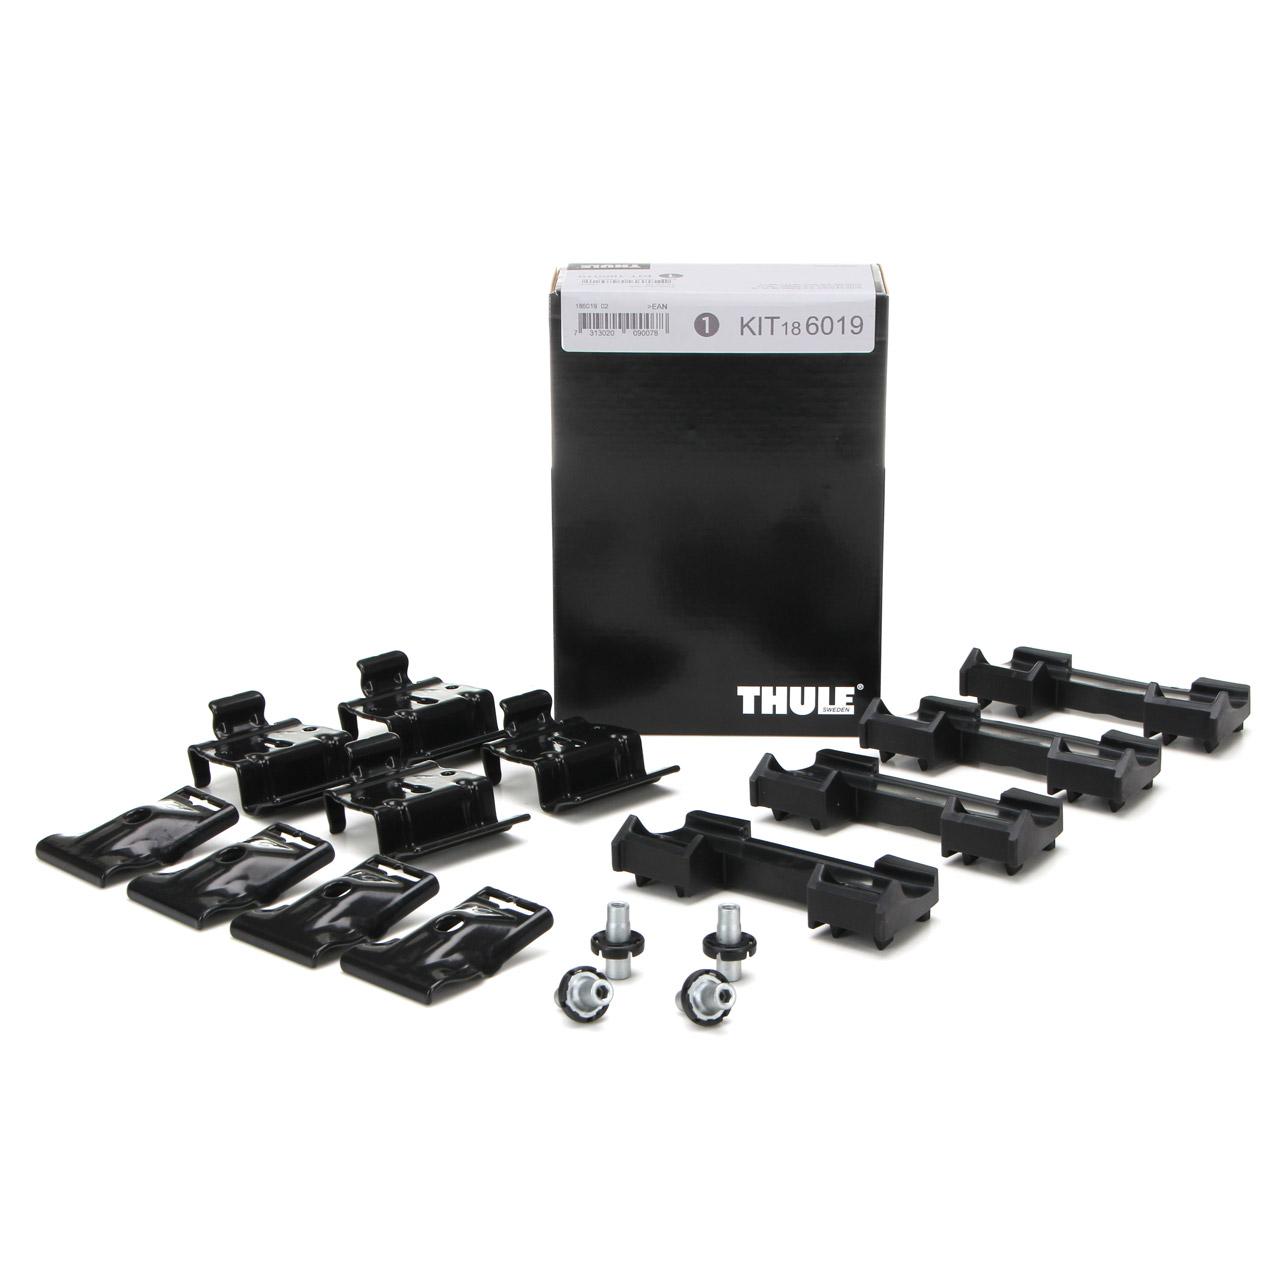 THULE 6019 Montagesatz Montagekit Dachträger Evo Flush AUDI A4 (B8 B9) Avant Q5 (FYB)